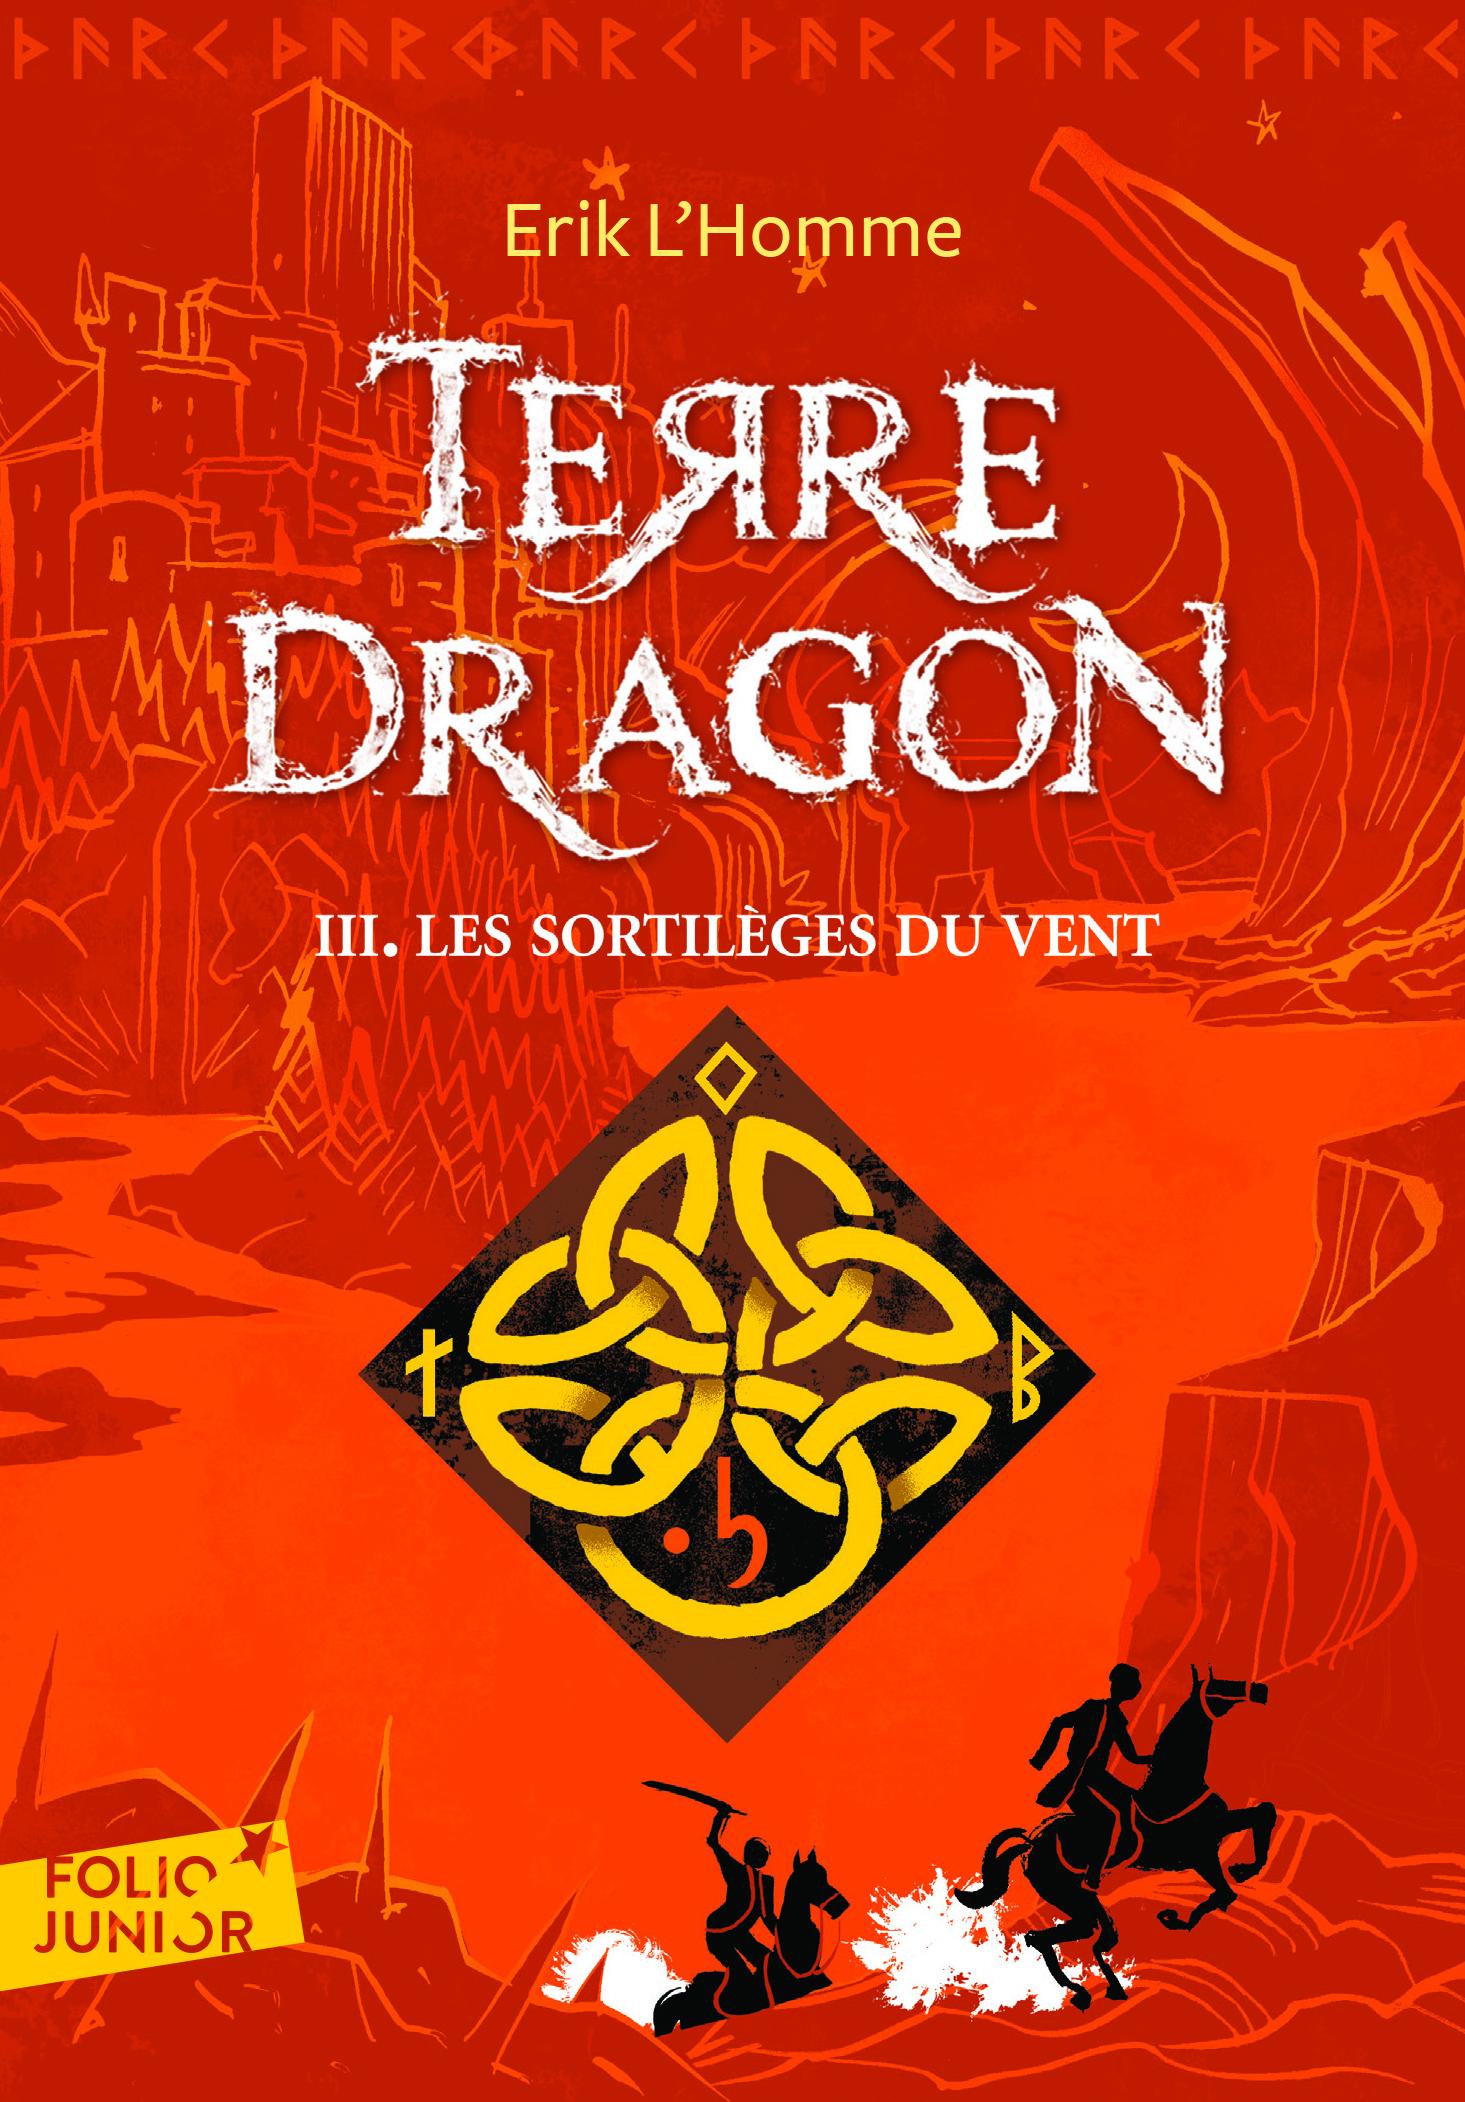 TERRE-DRAGON 3. LES SORTILEGES DU VENT